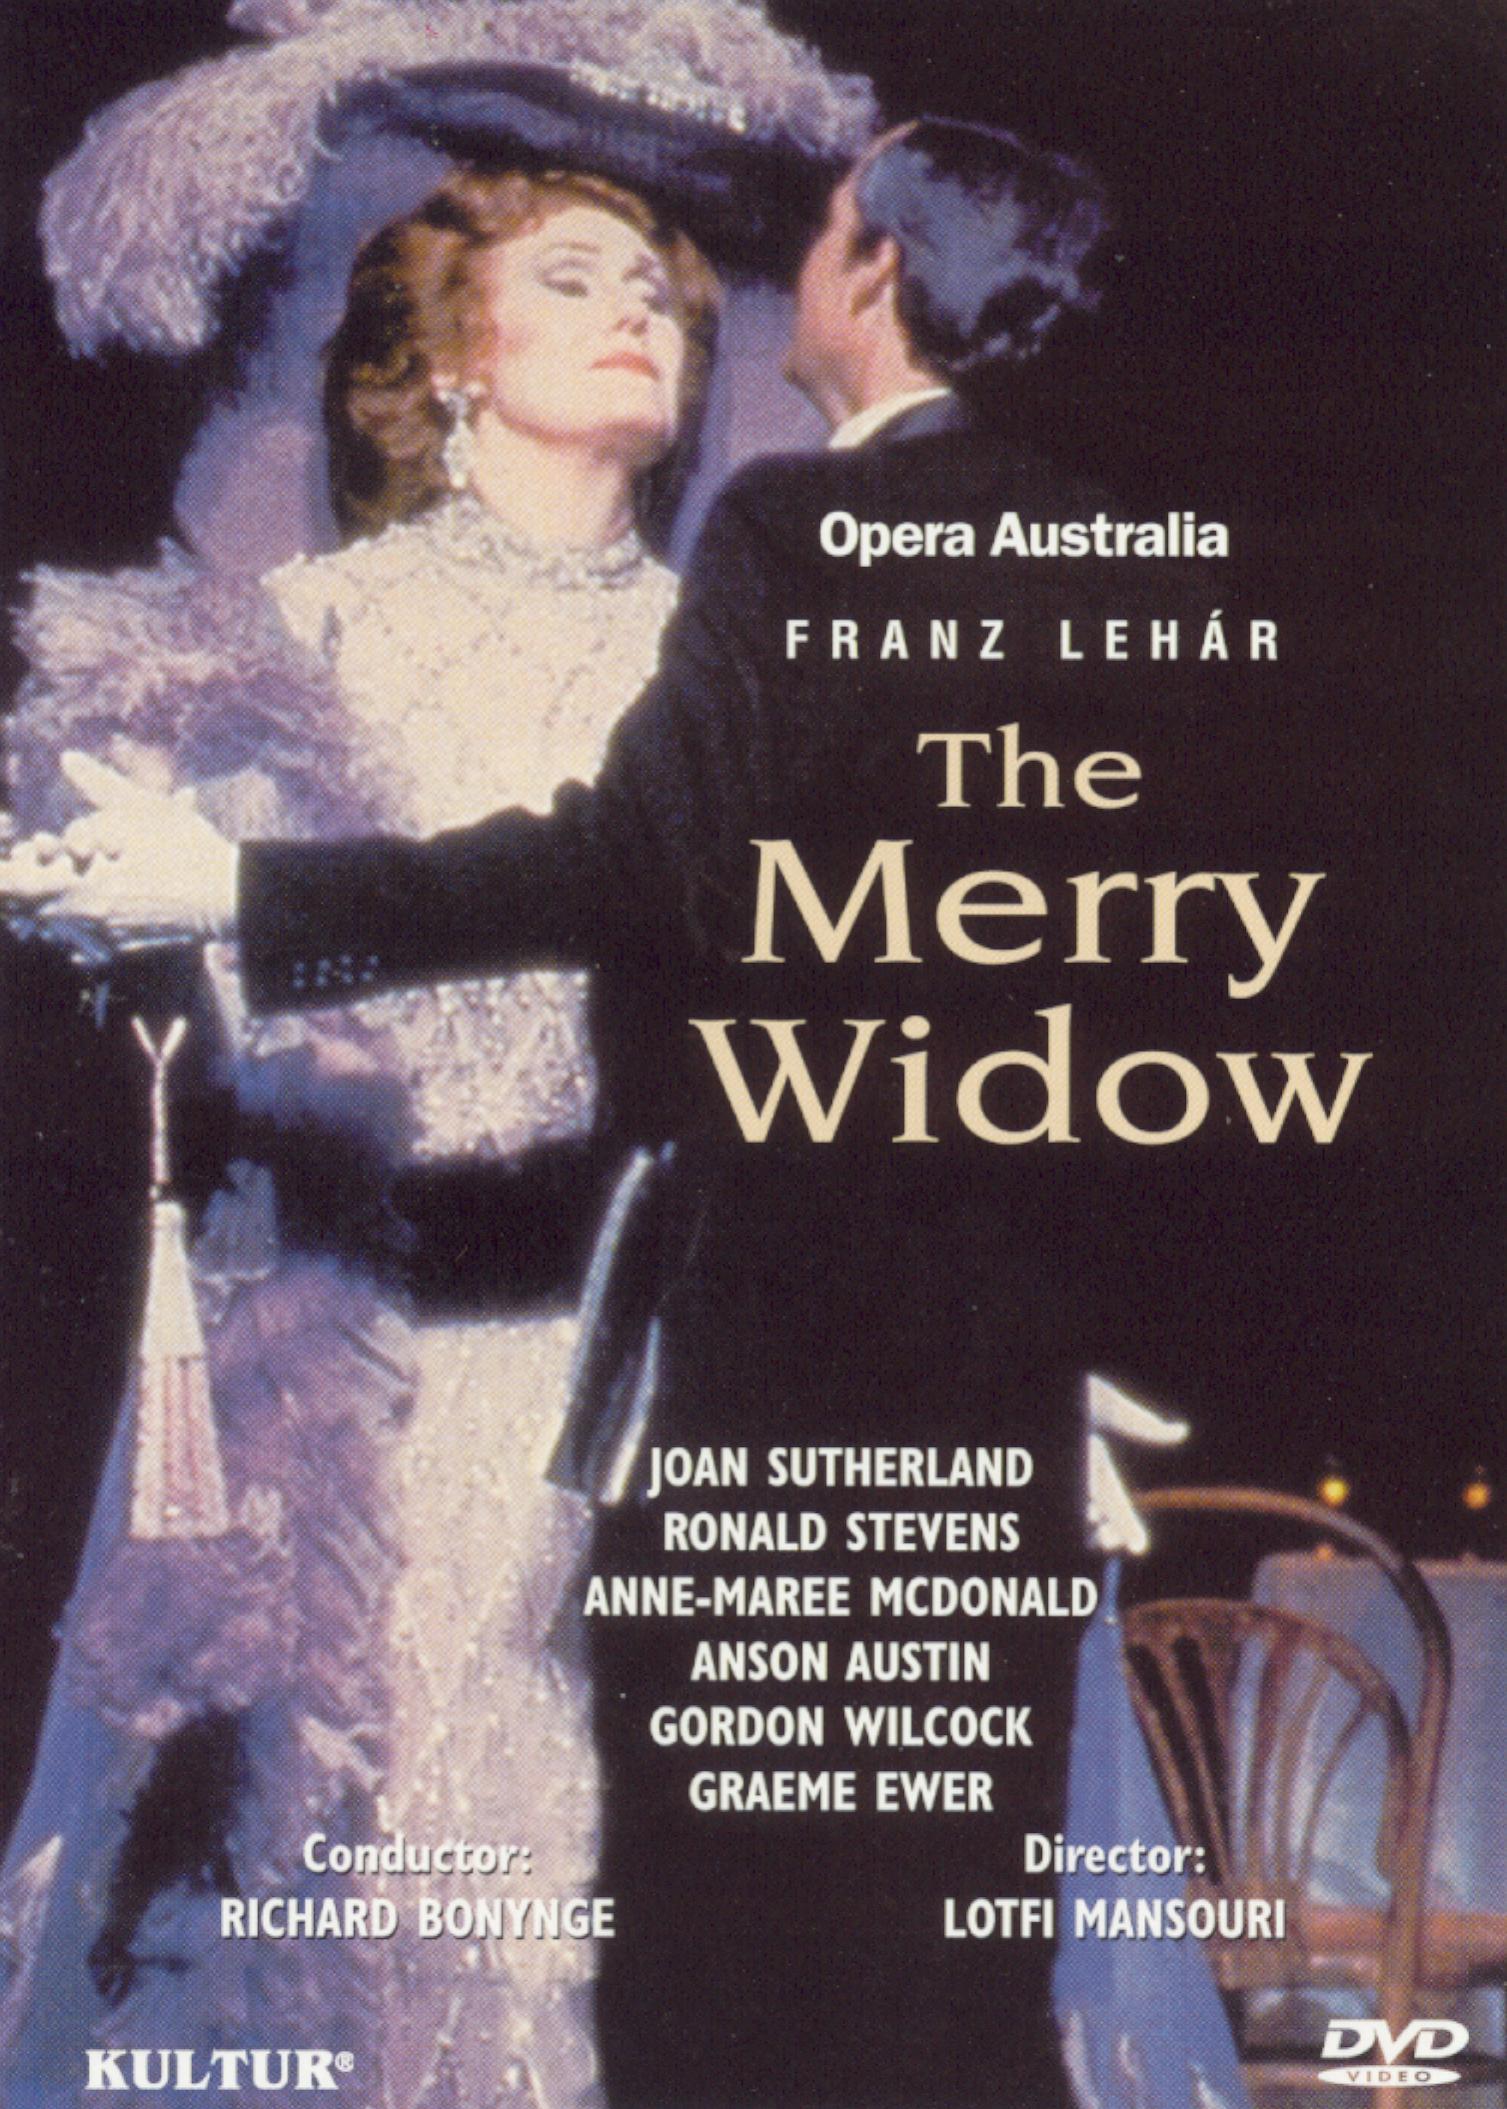 The Merry Widow (Opera Australia)